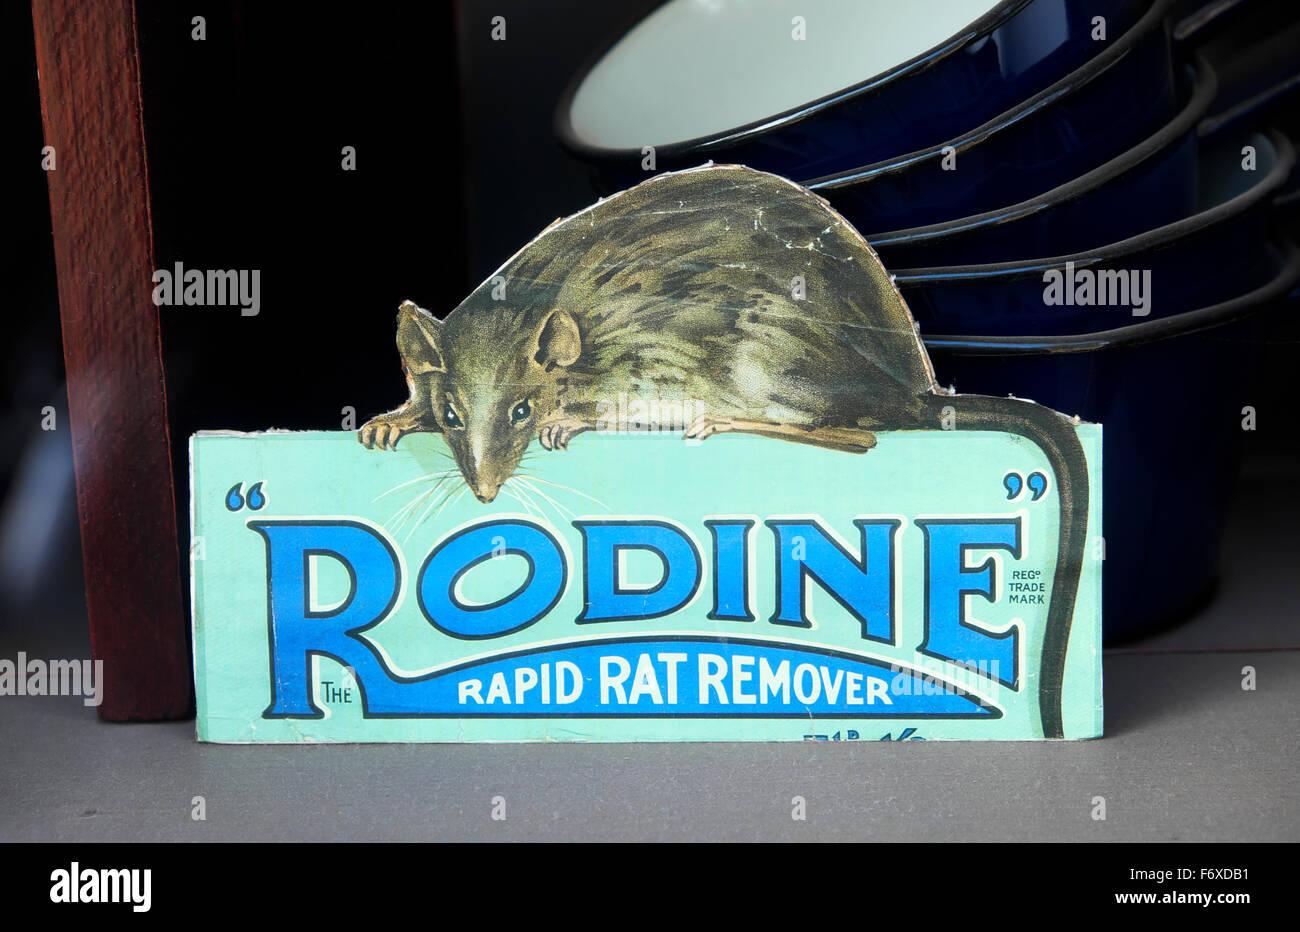 Rodine Rat Remover vintage rat poison advertisement Great Britain  KATHY DEWITT - Stock Image